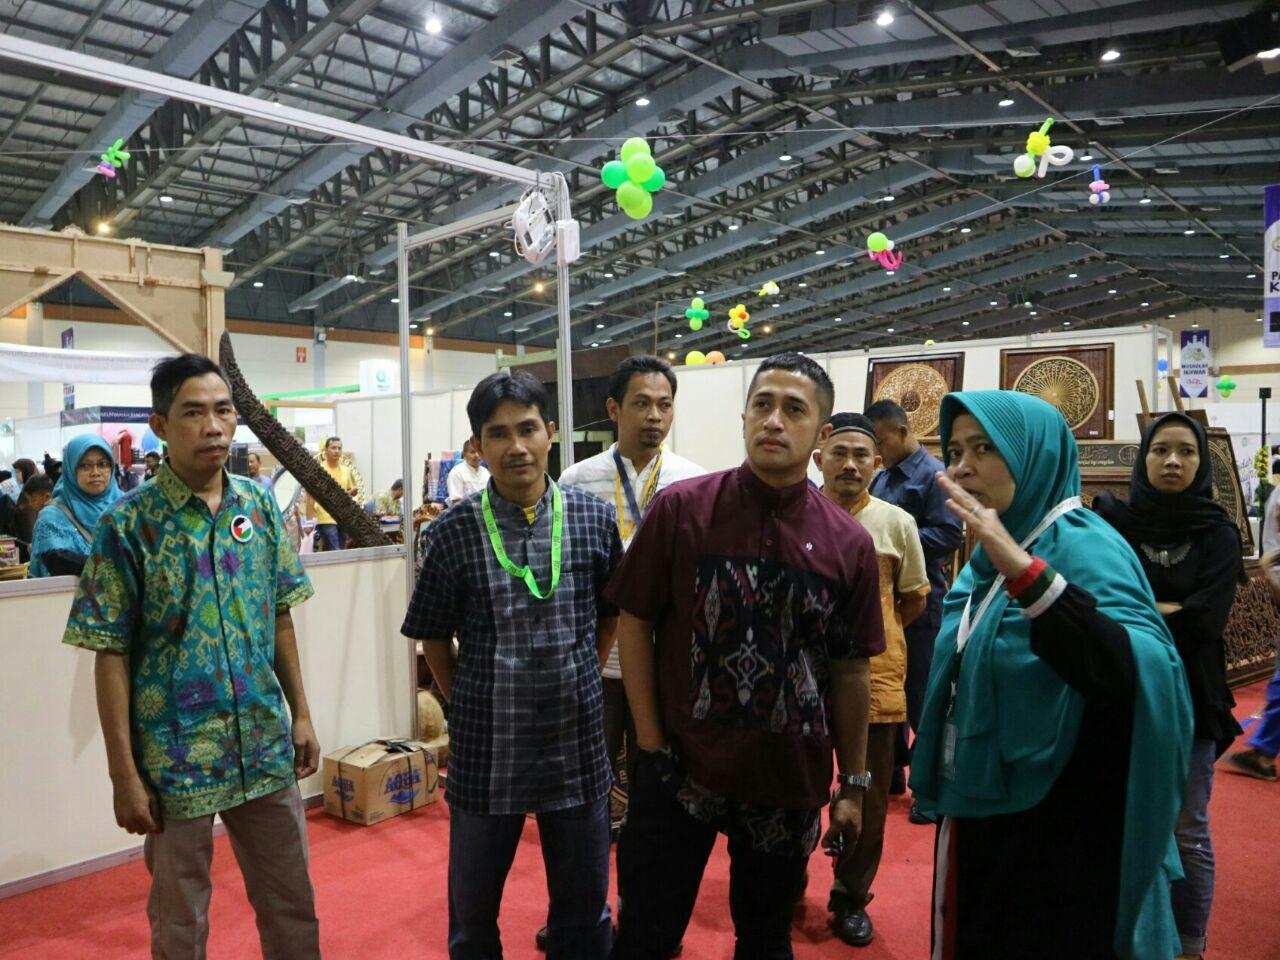 Pengunjung Islamic Book Fair Hari ke Tiga Masih Membludak3